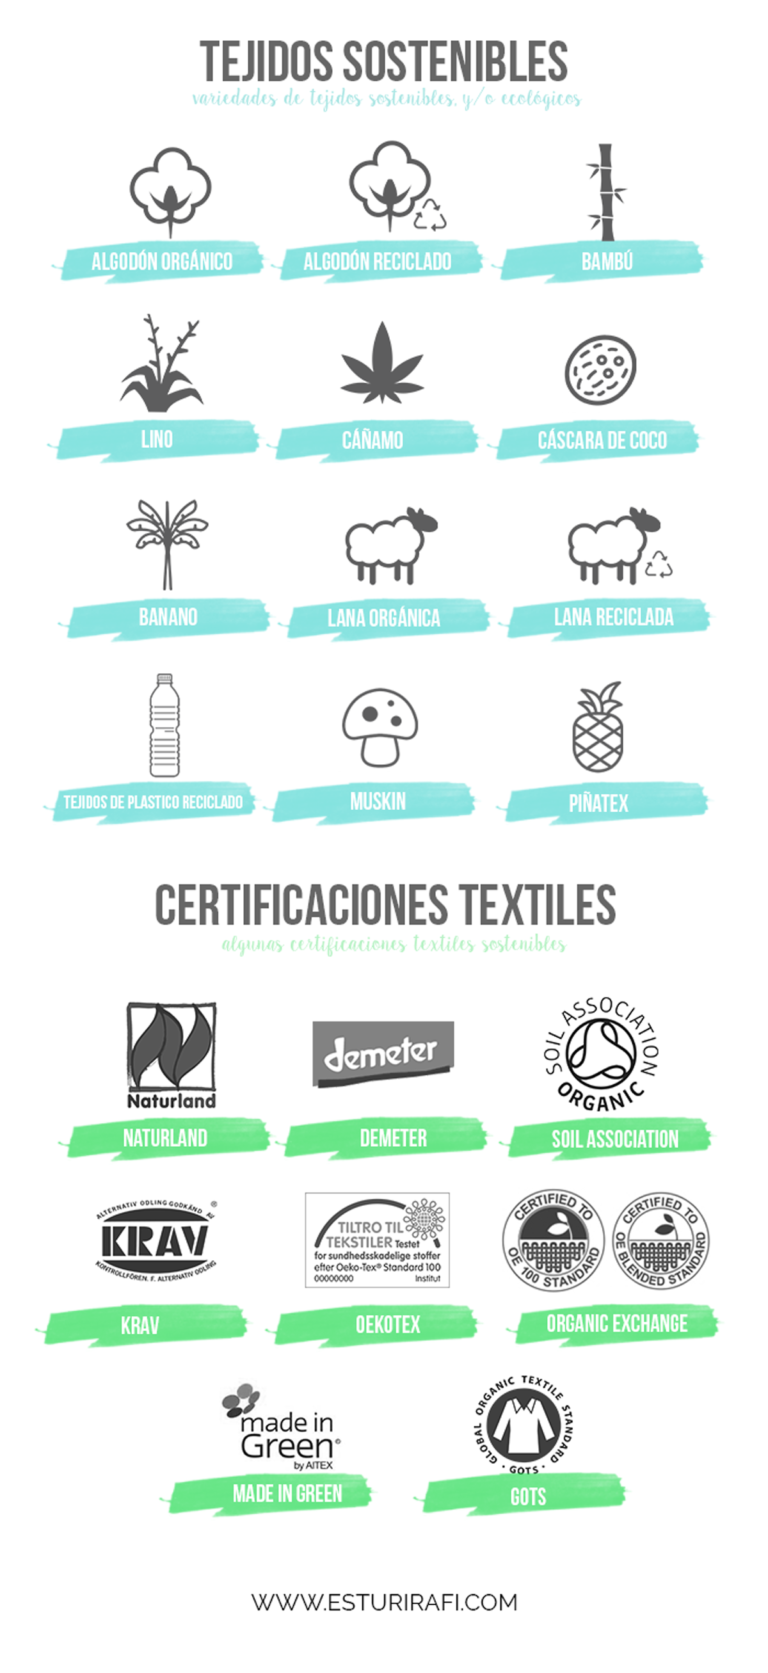 tejidos-naturales-sostenibles